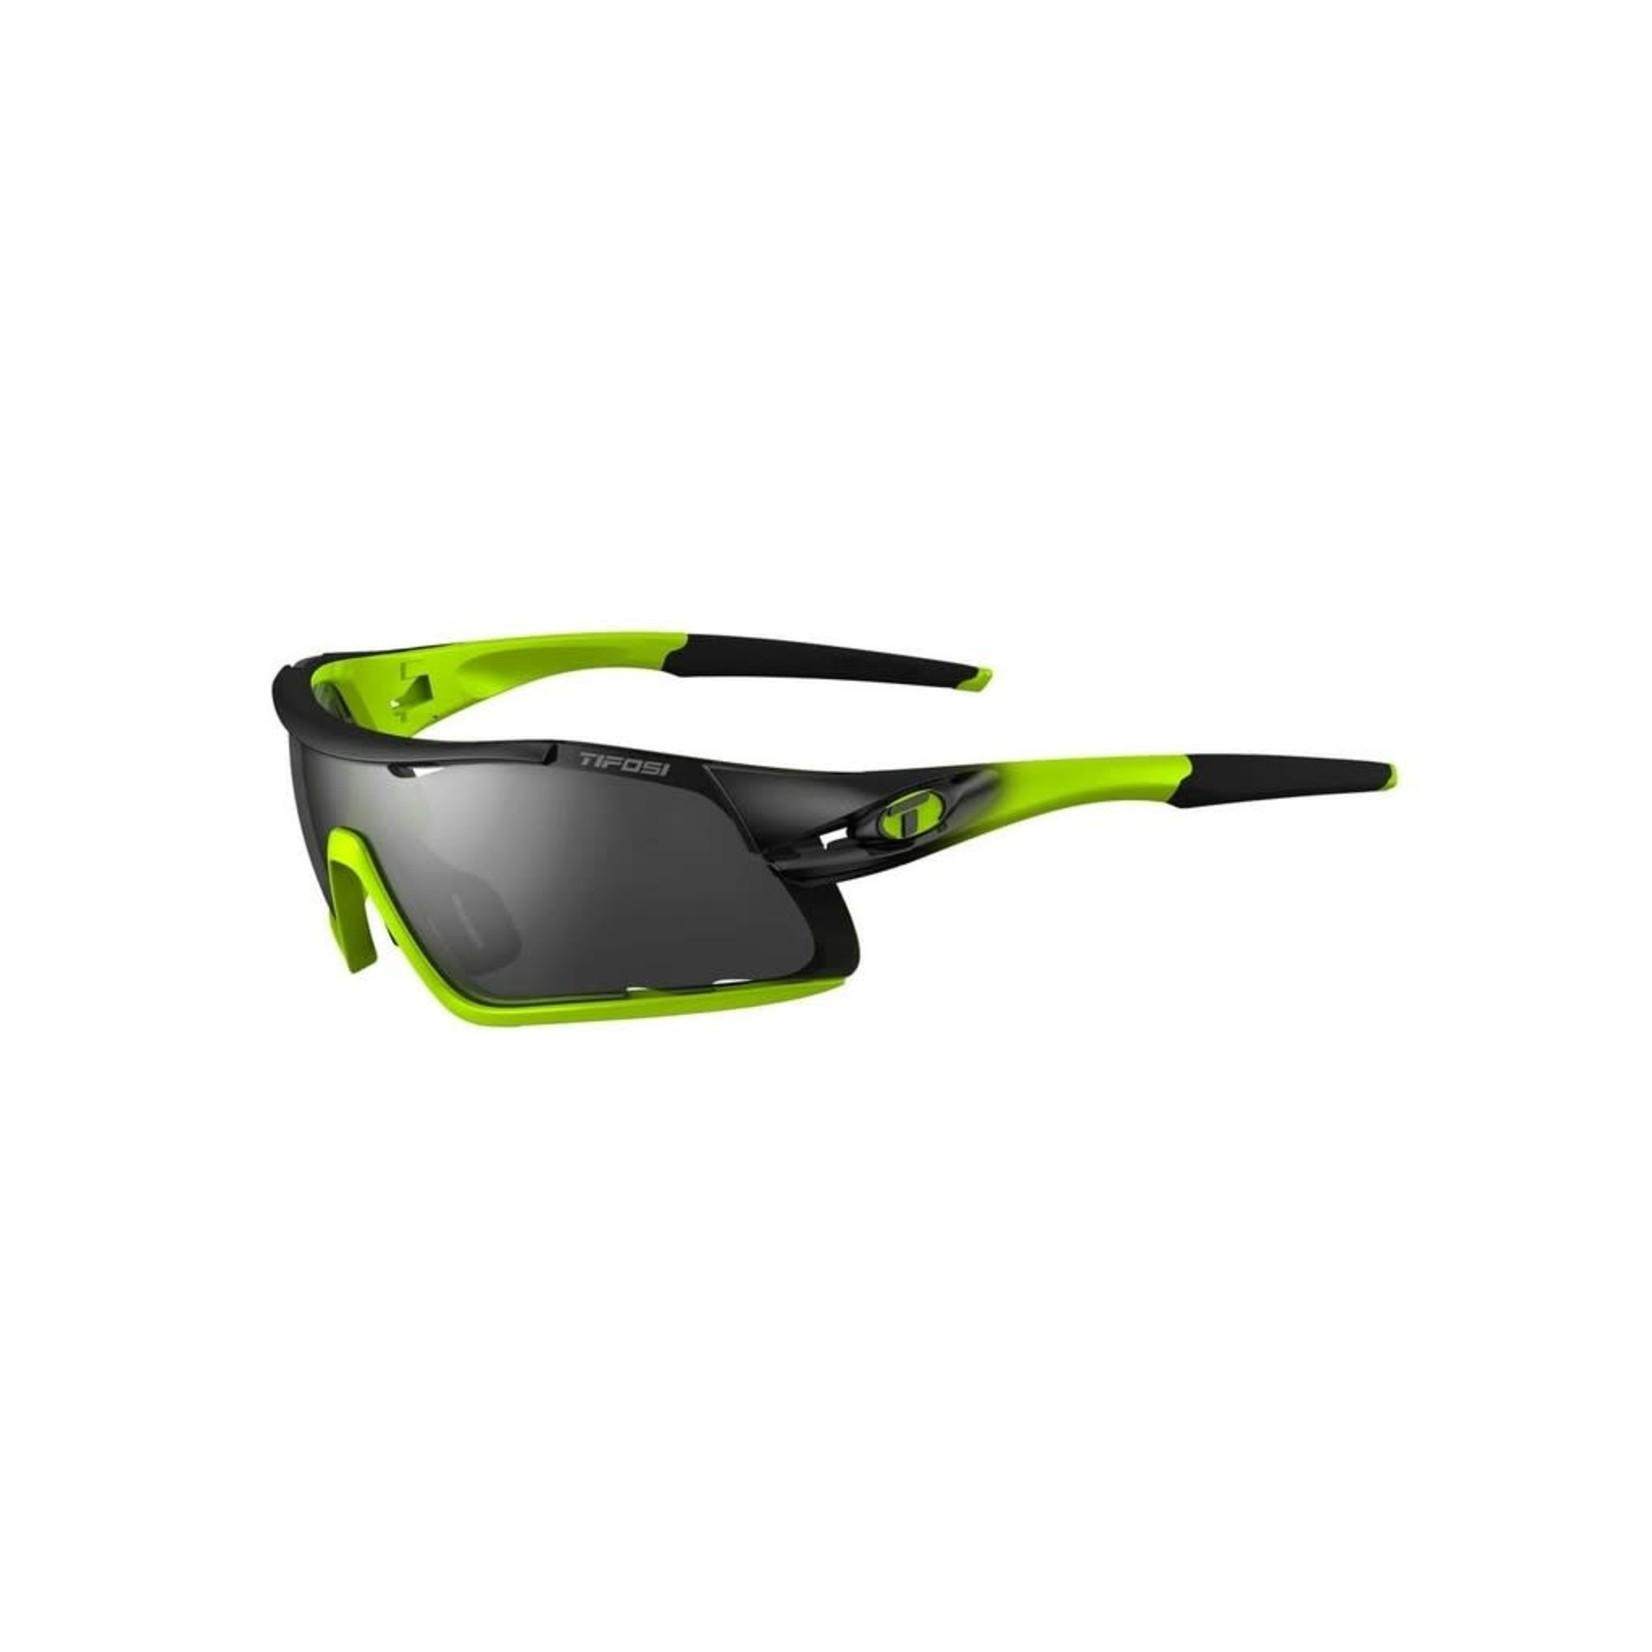 TIFOSI OPTICS Sunglasses Tifosi Davos Race Neon